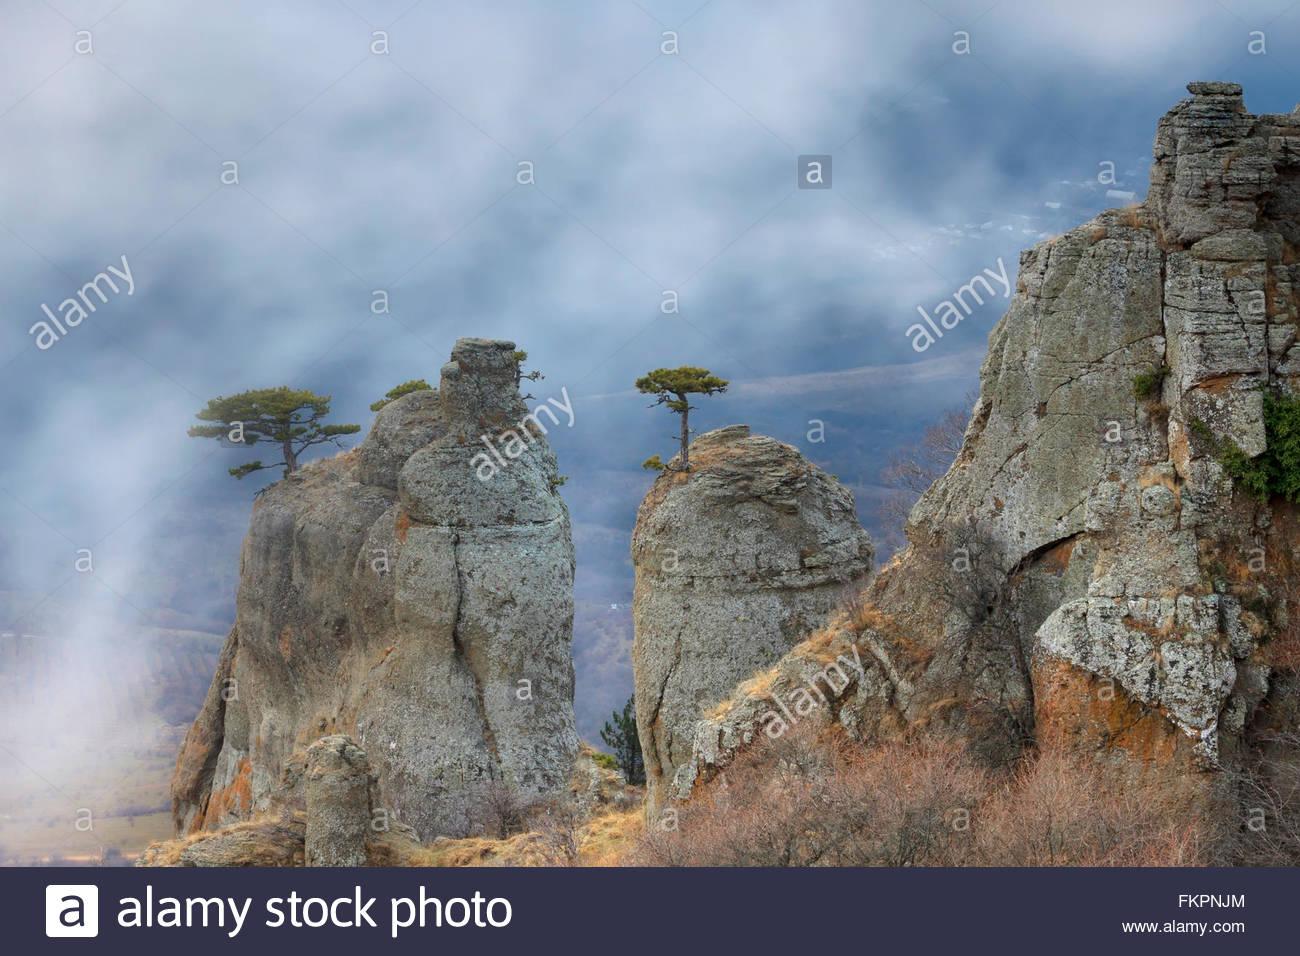 Mysty mountains - Stock Image